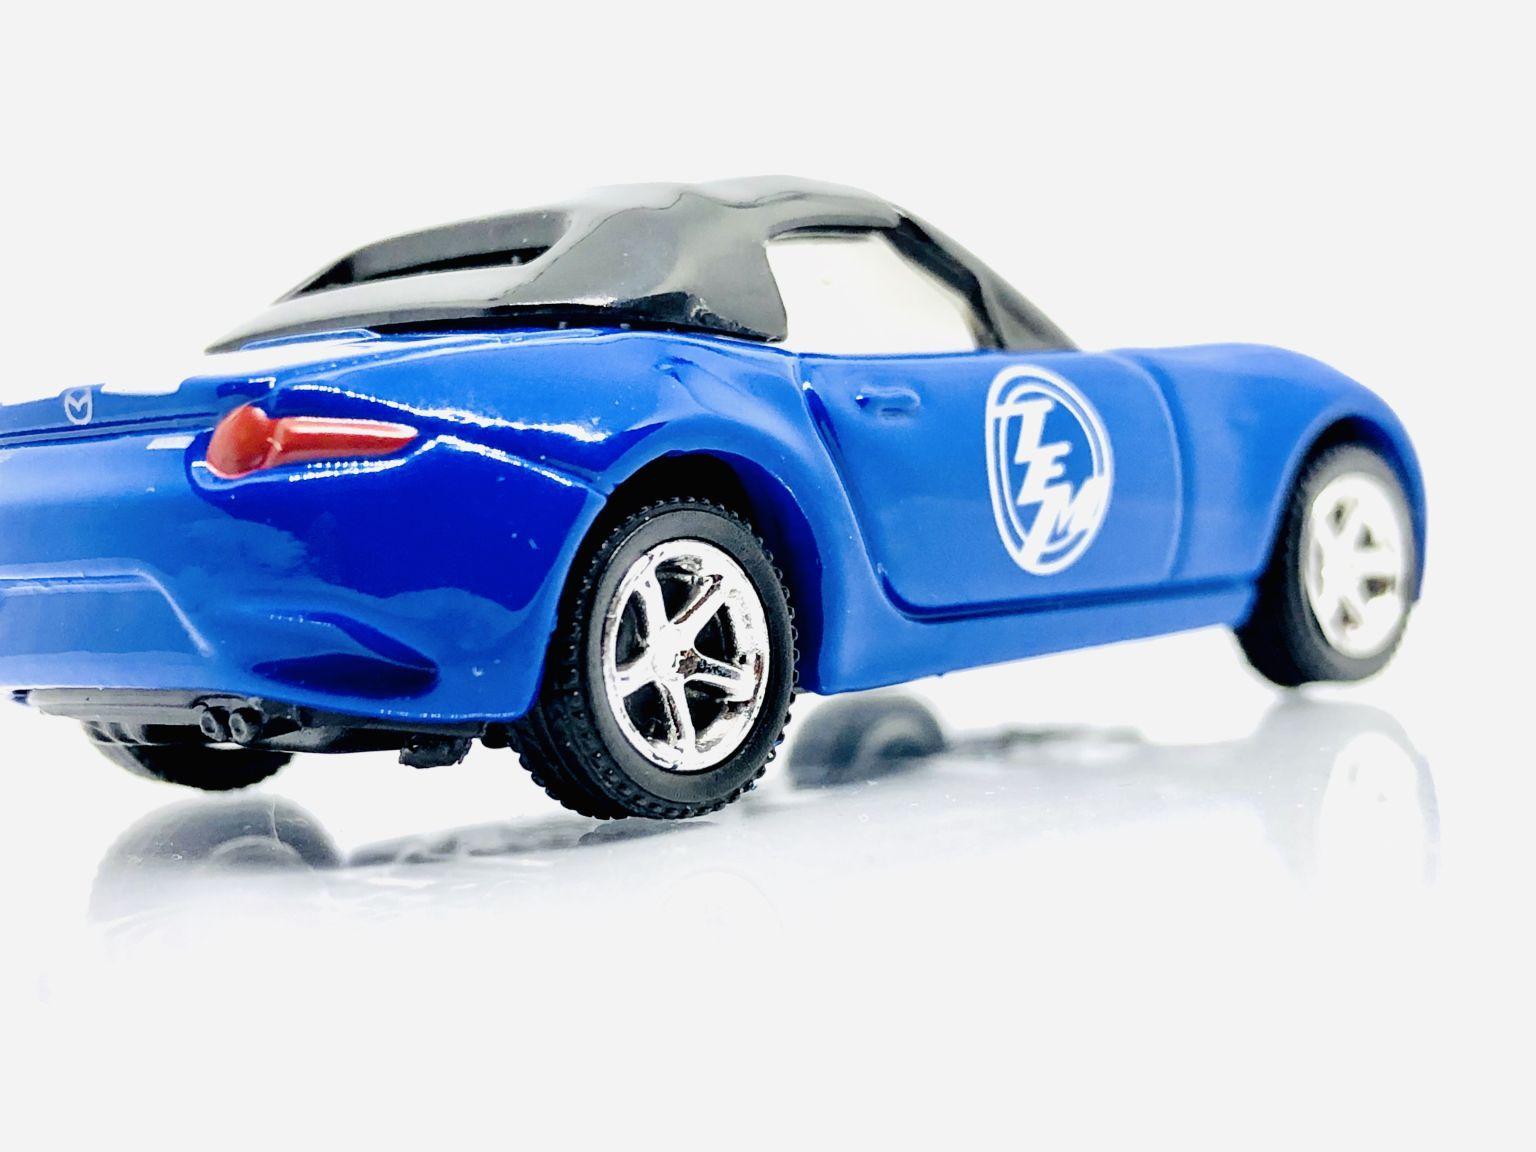 Tomica Showdown Audi R8 And Mazda Rx7 Diecastgraphy Mazda Audi R8 Audi